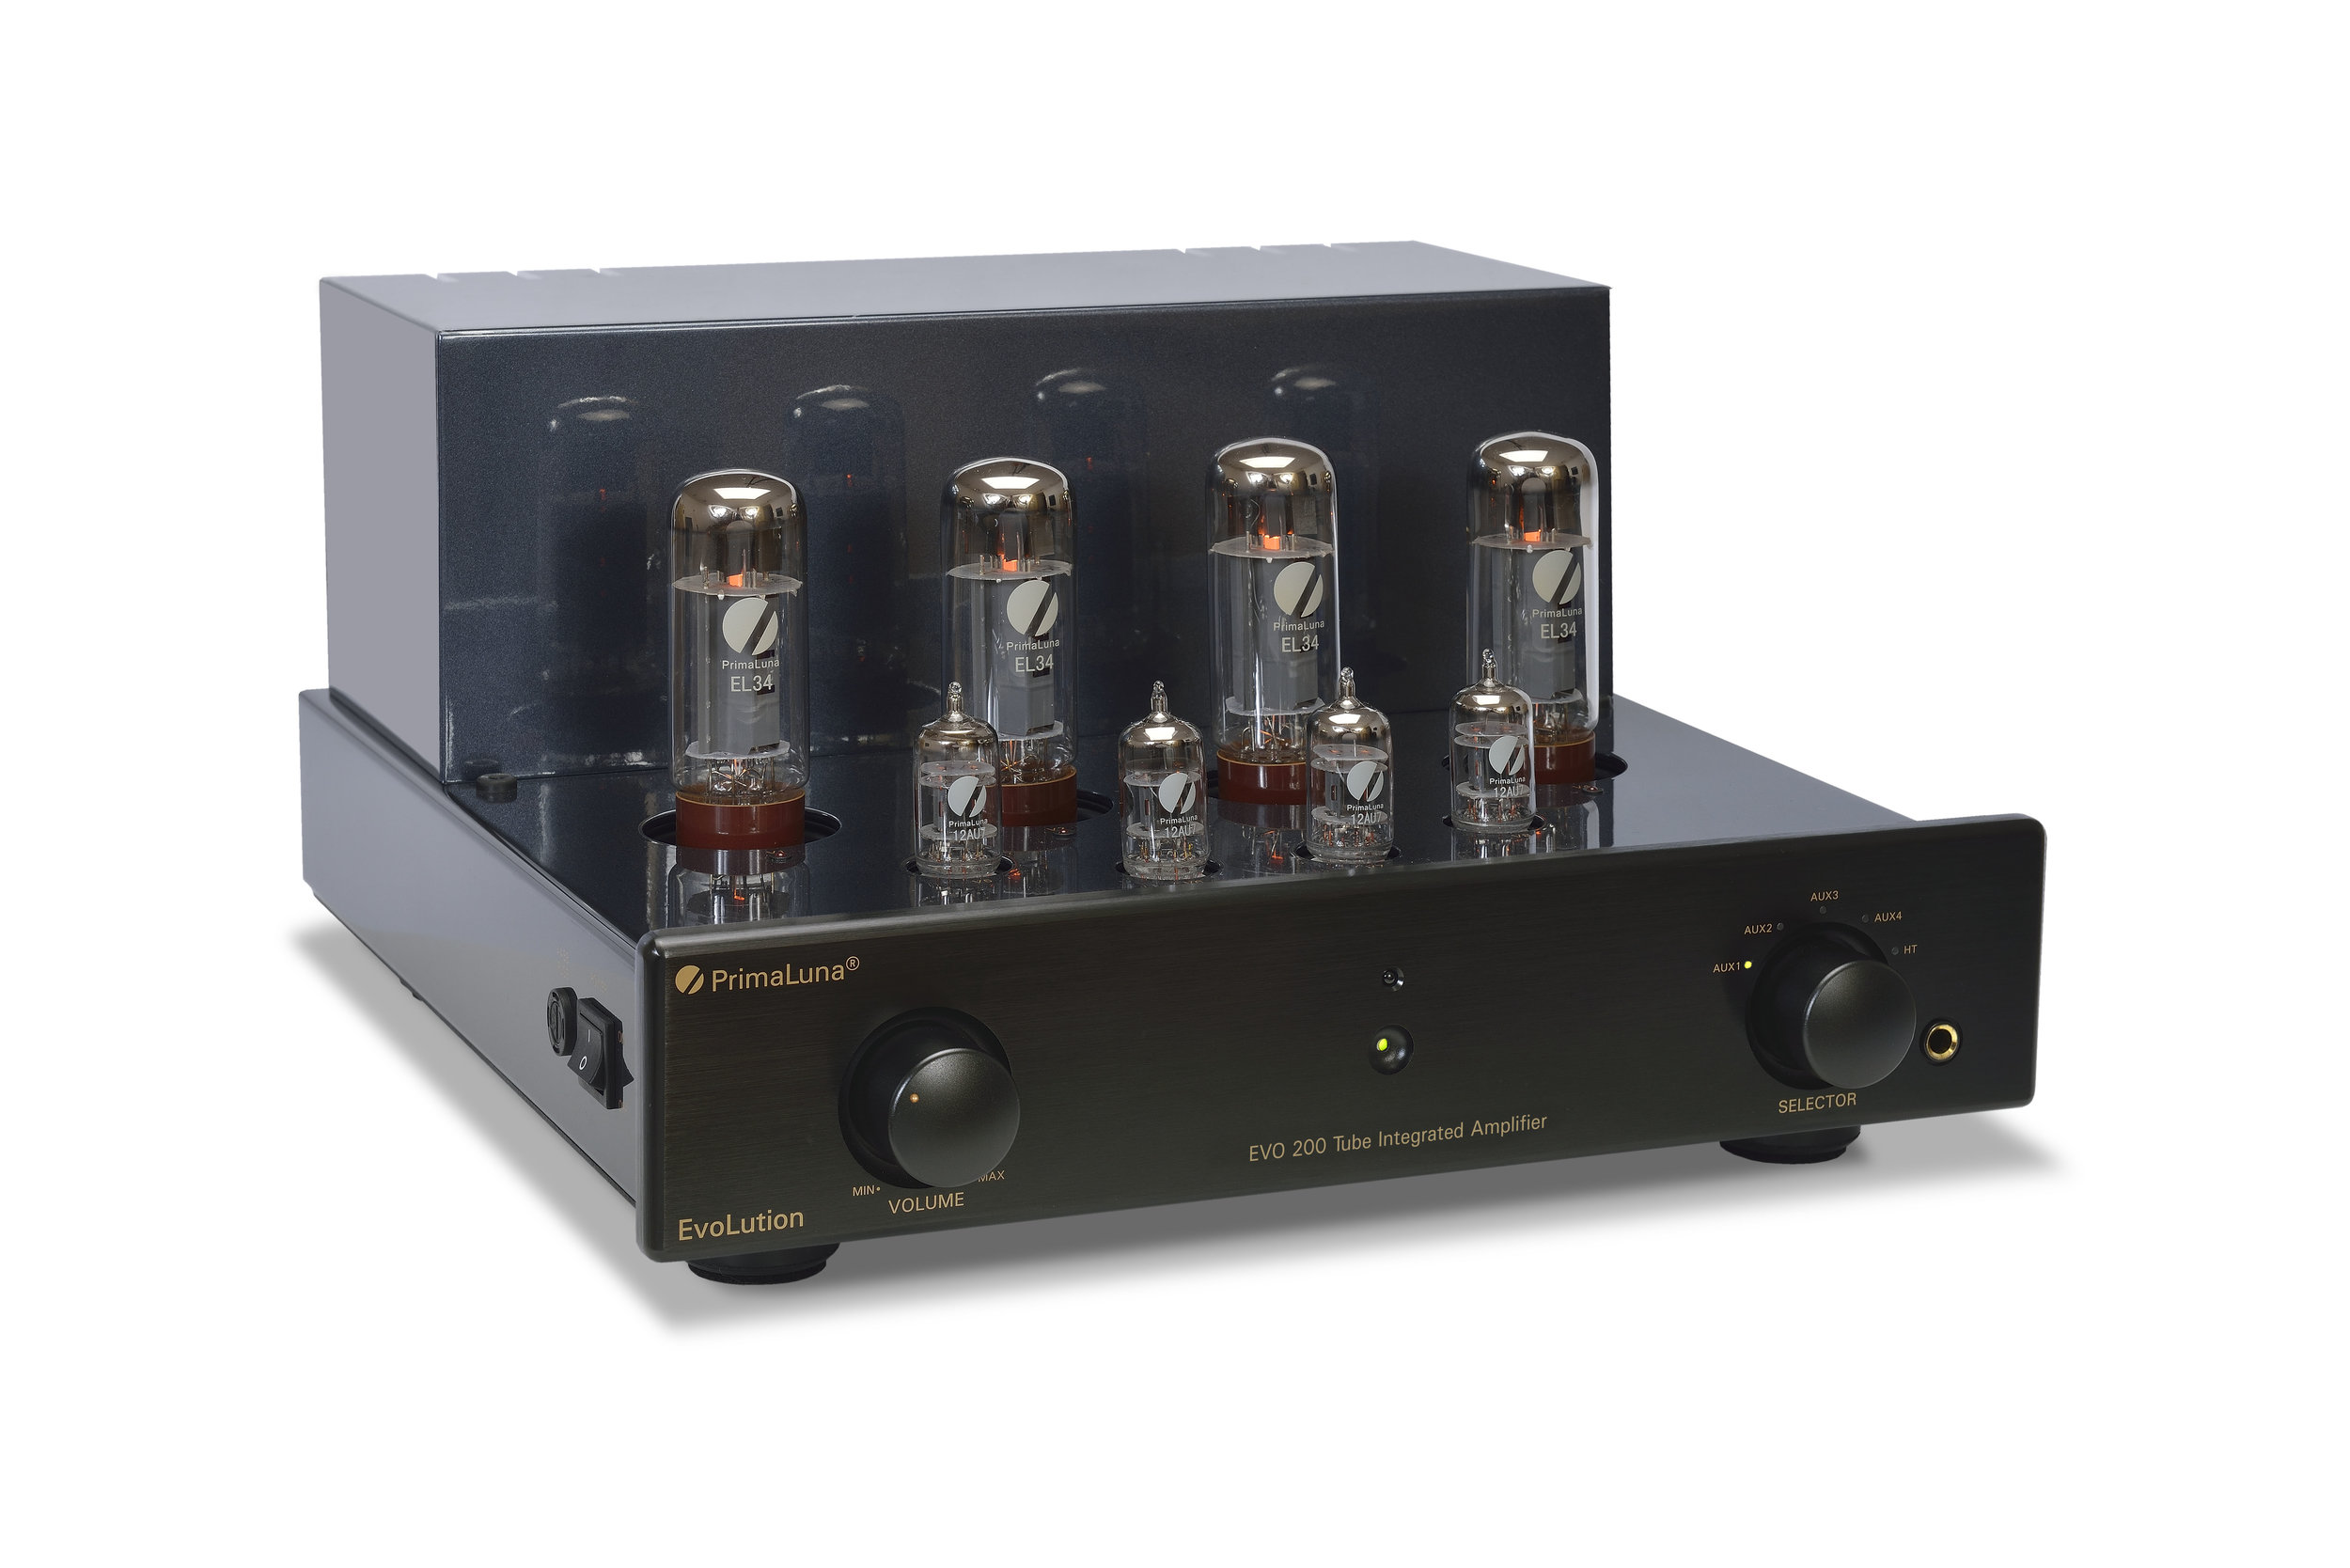 114b - PrimaLuna Evo 200 Tube Integrated Amplifier - black - slanted - without cage - white background.jpg